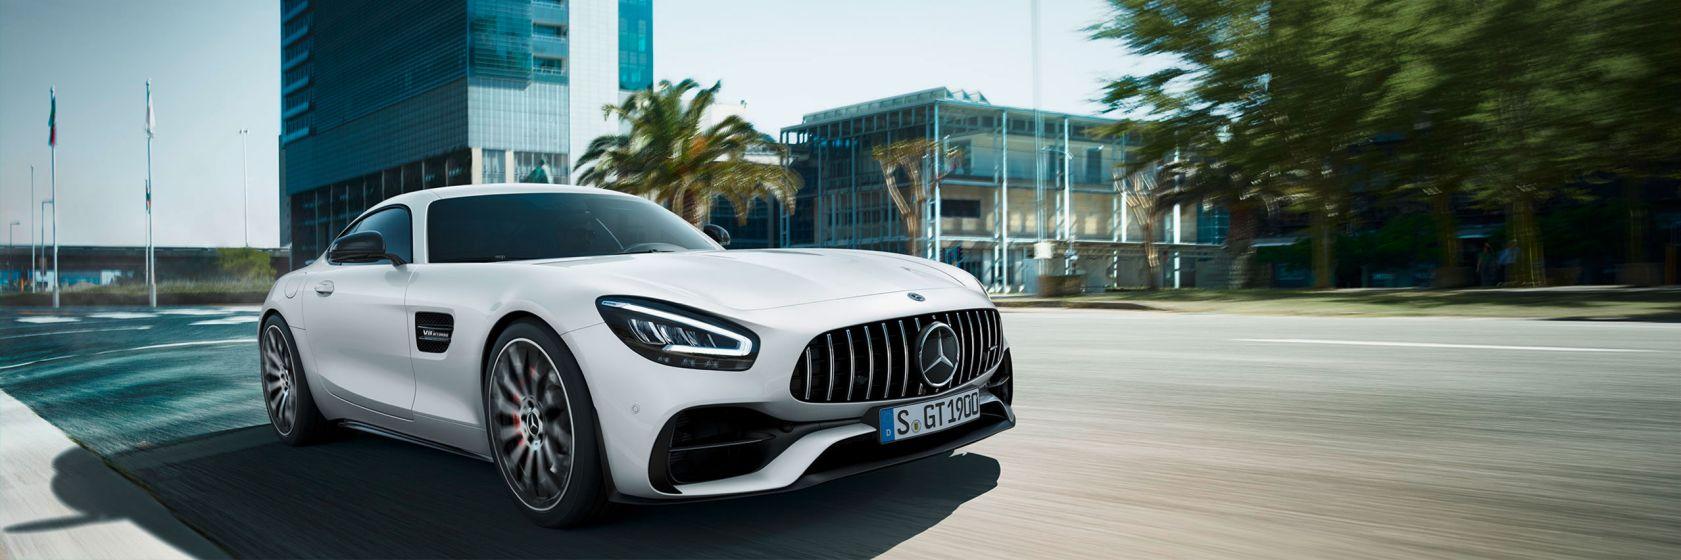 Mercedes Benz Amg Gt >> Mercedes Amg Gt